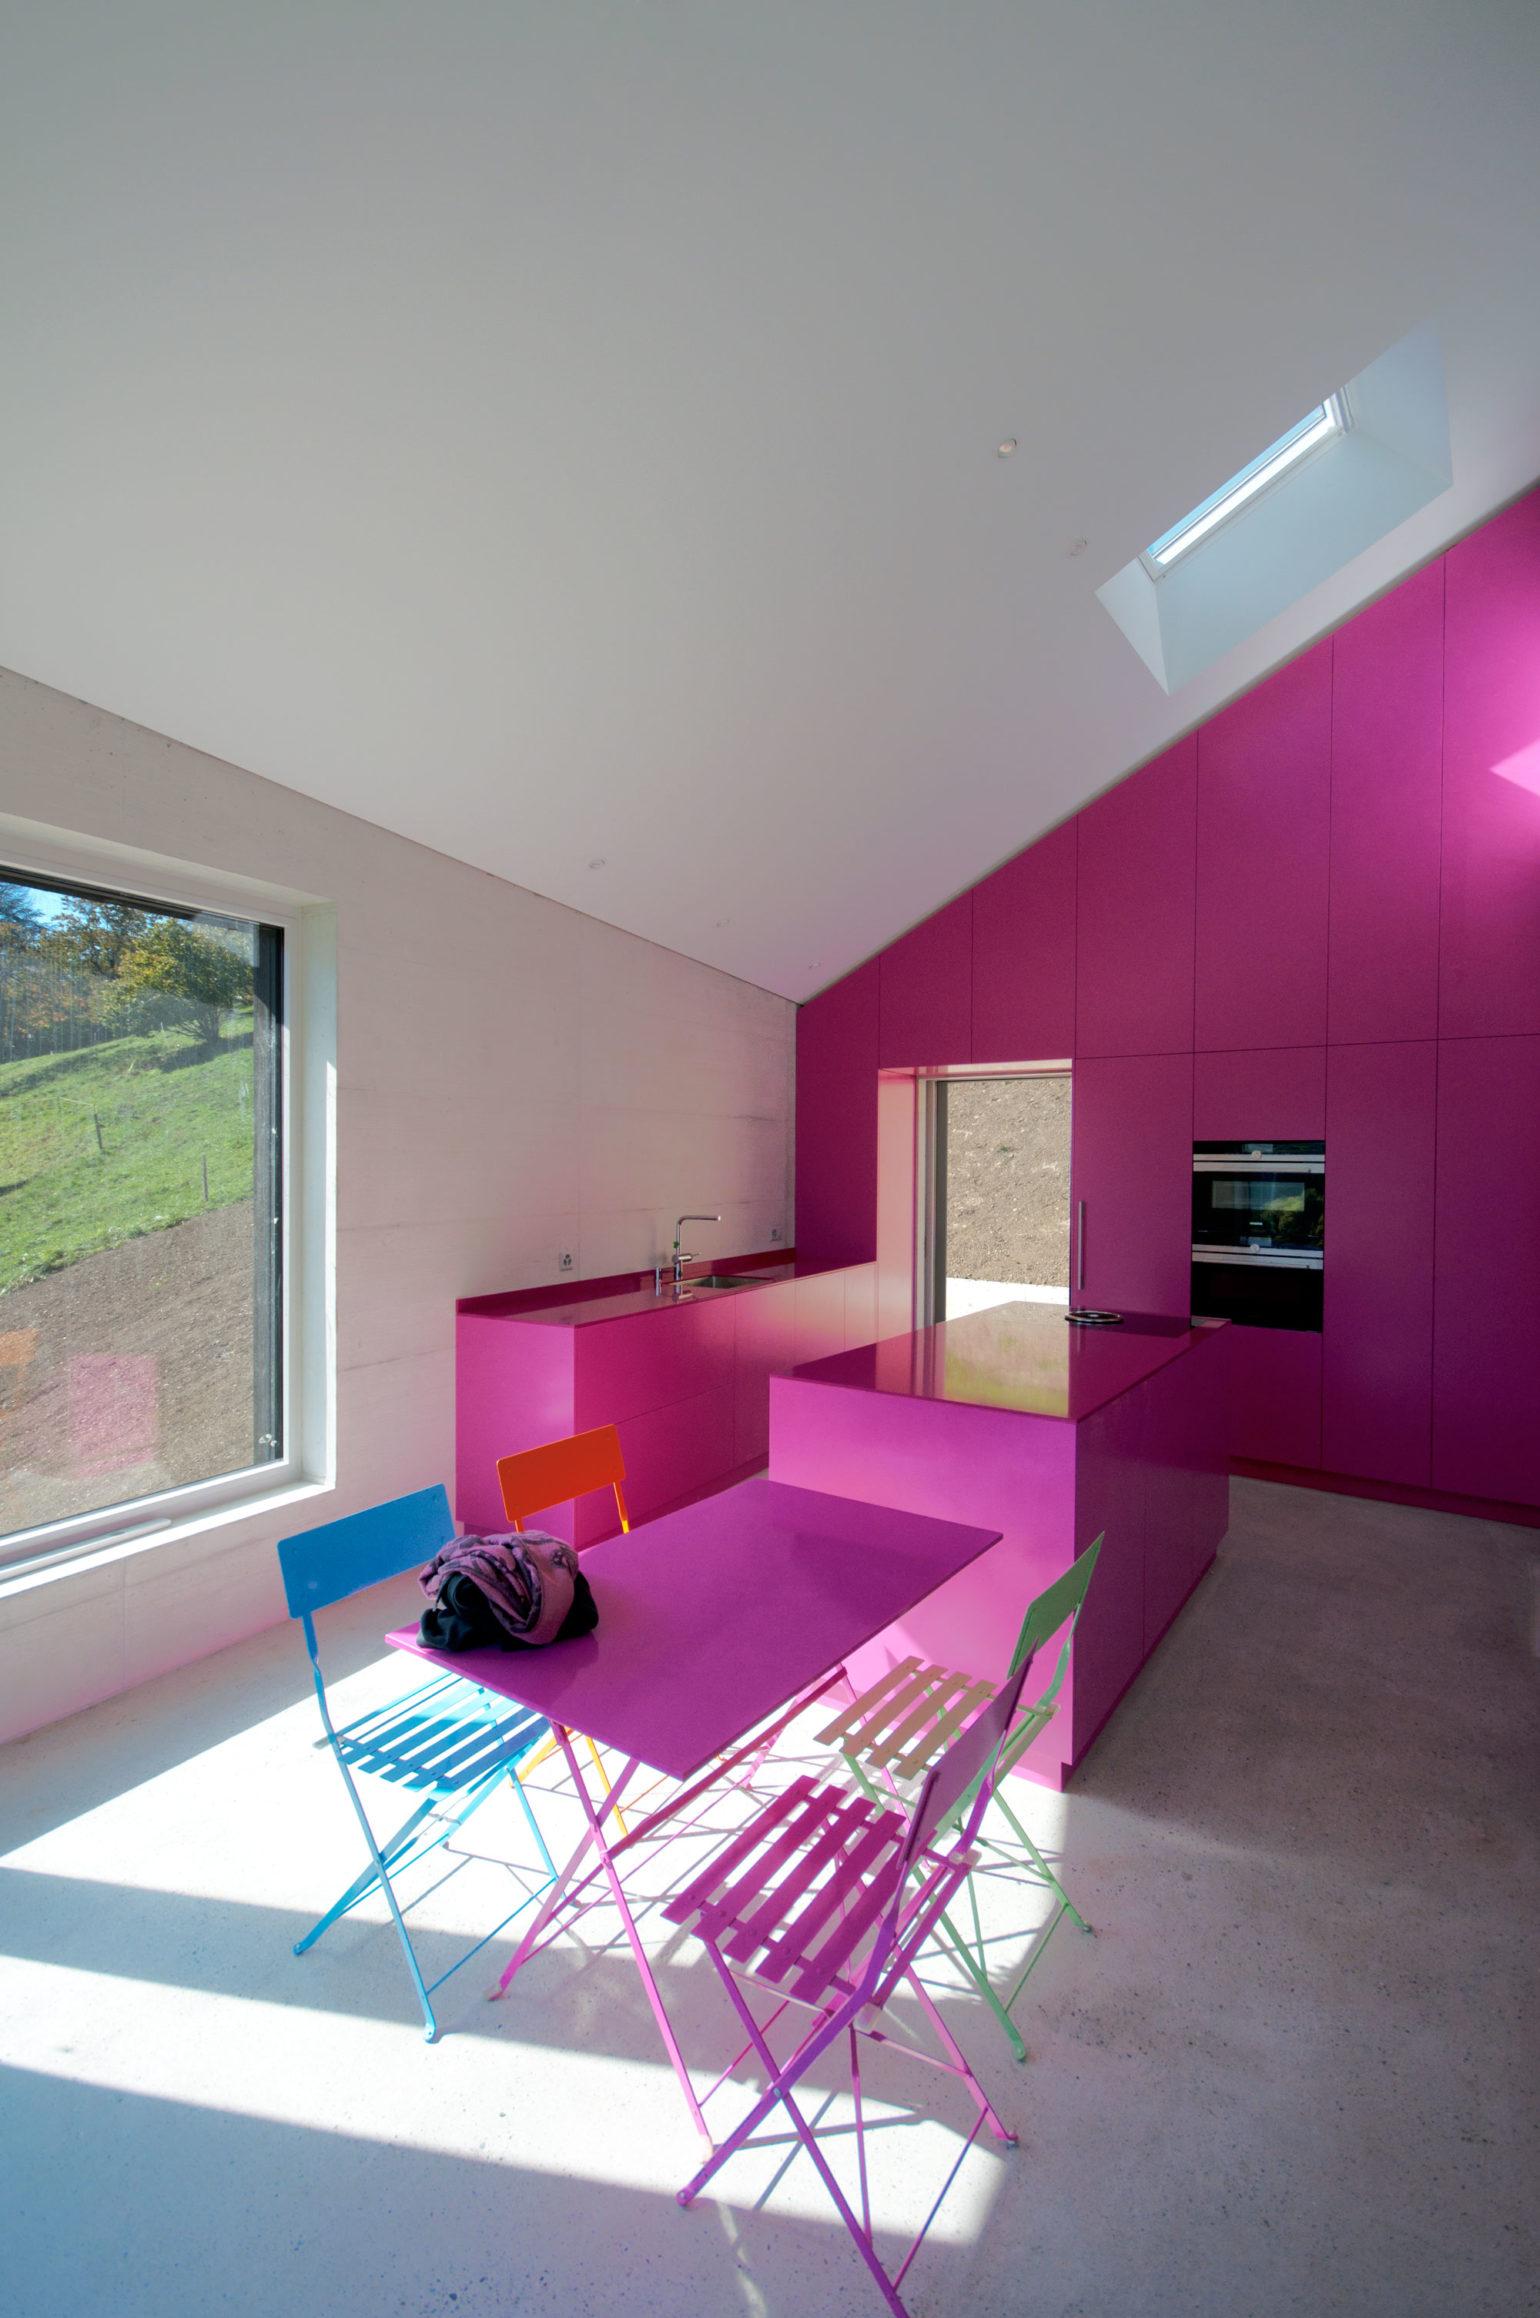 maison_dubosson_troistorrents_meyer_architecture_sion_07